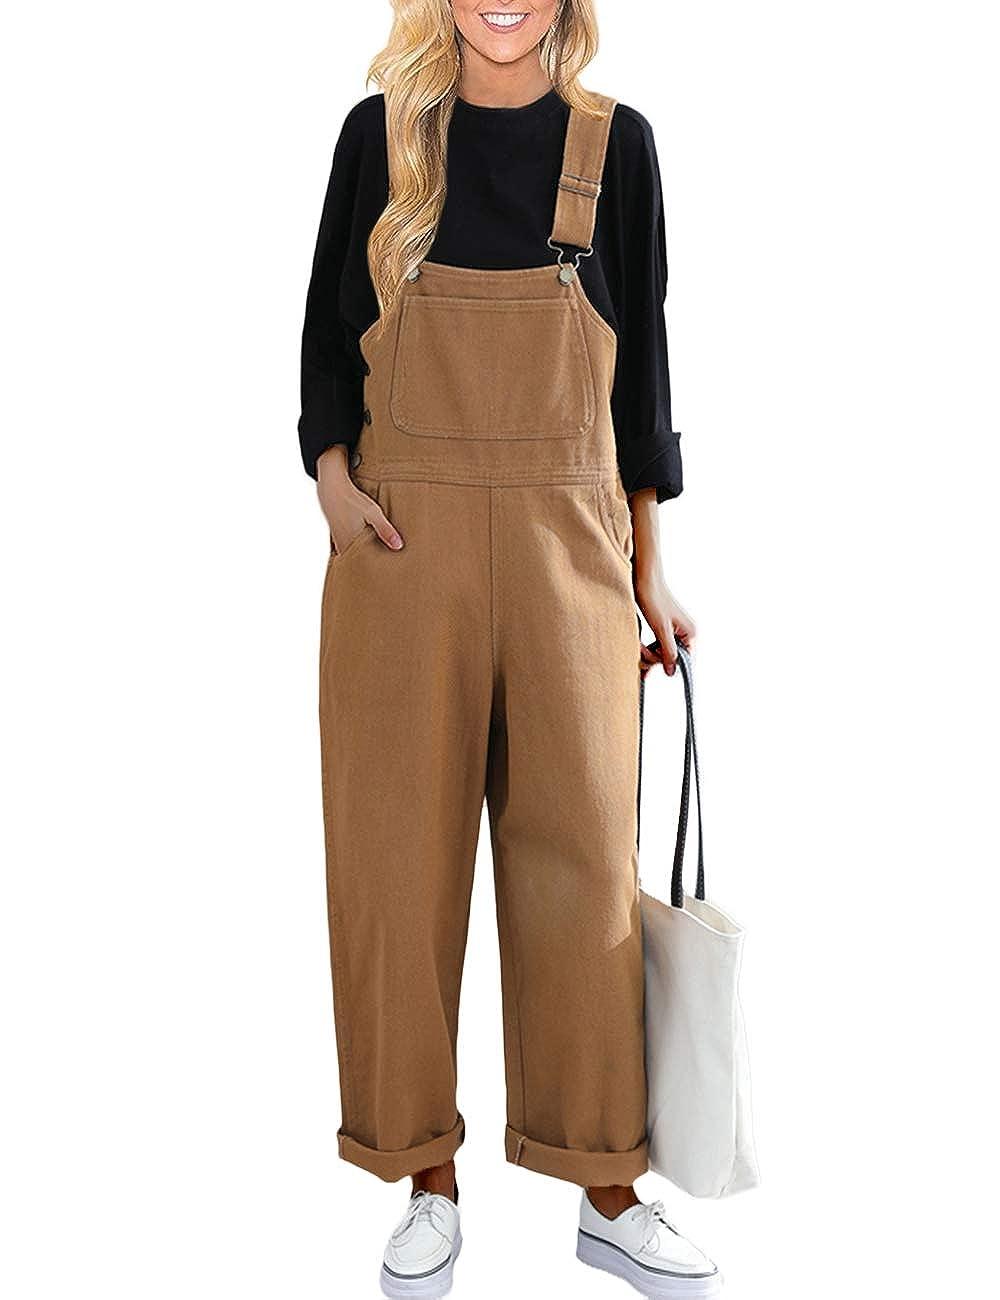 Innifer Womens Classic Casual Wide Leg Pants Denim Bib Overalls Jumpsuits